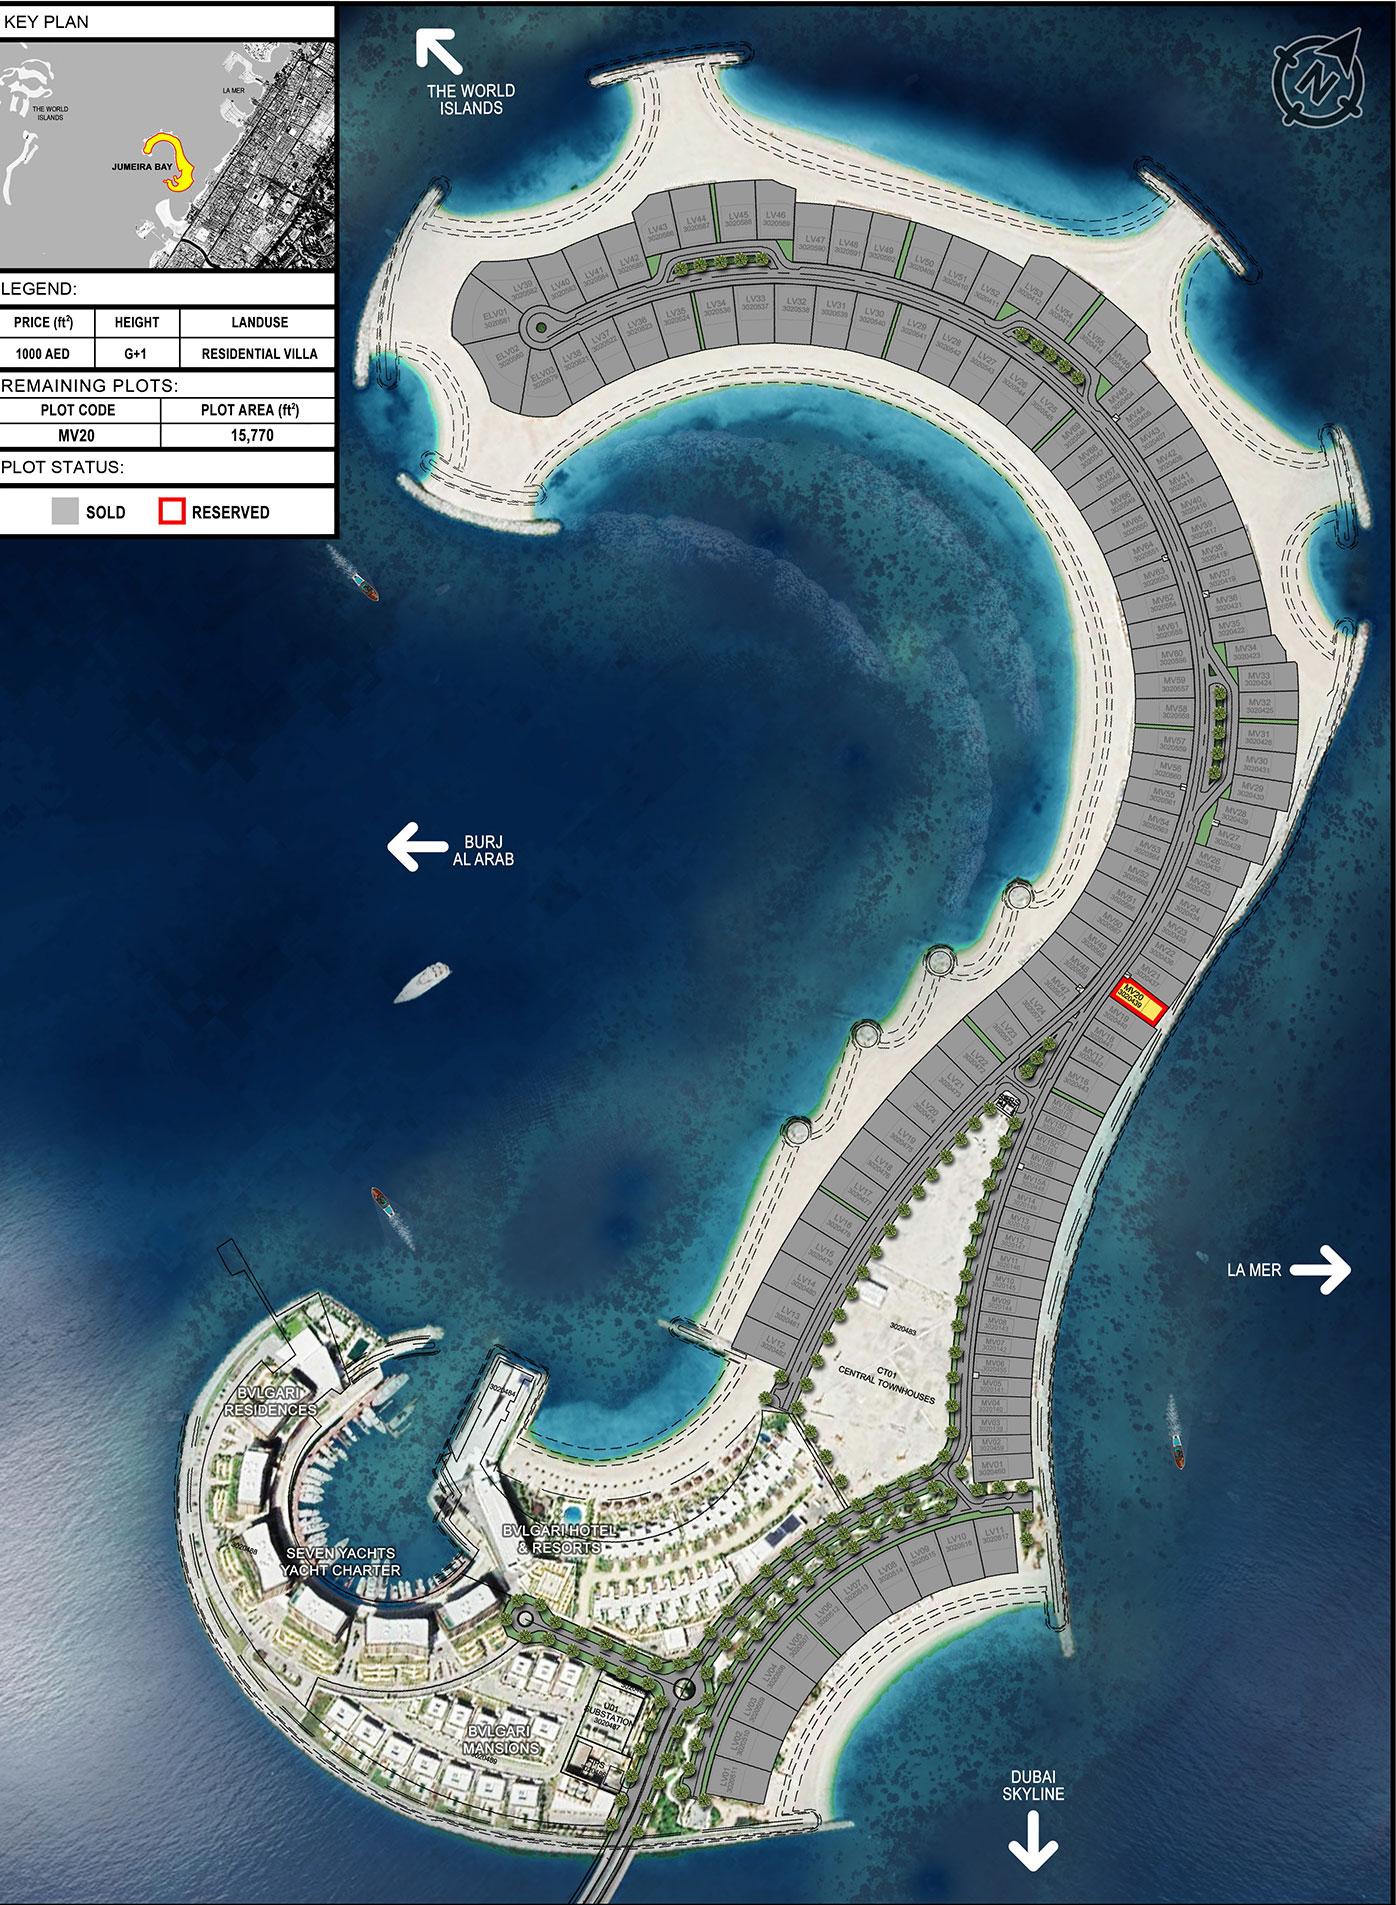 Meraas-Jumeira-Bay-Plots Master Plan